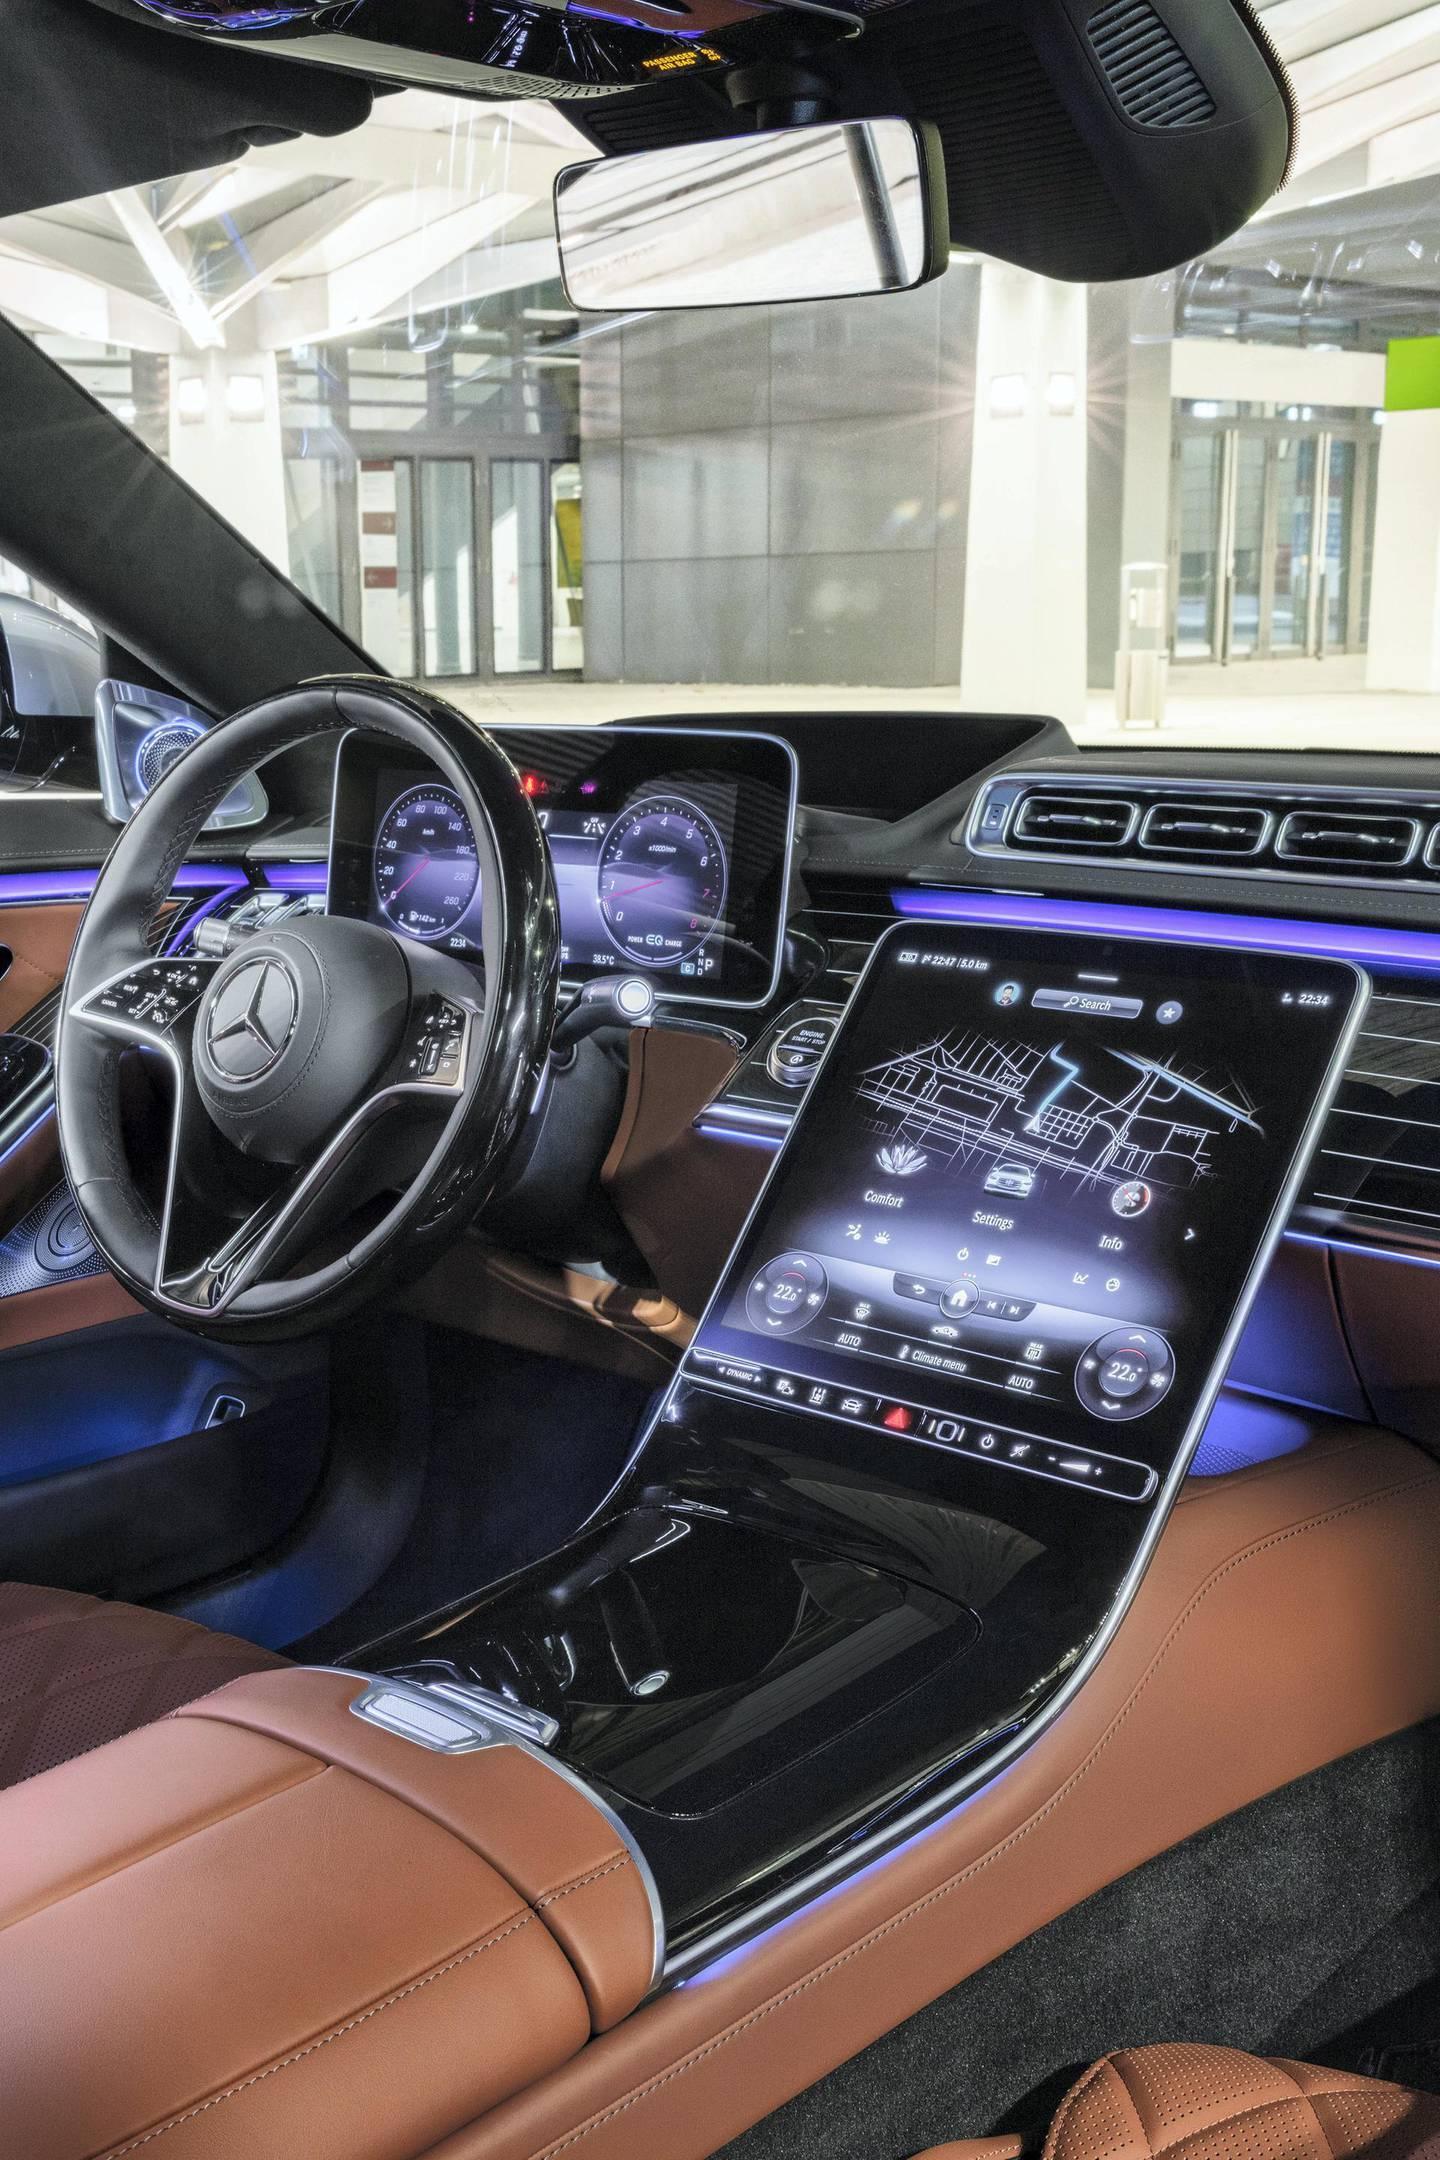 Mercedes-Benz S-Klasse, 2020, Outdoor, Interieur: Leder Nappa Sienabraun // Mercedes-Benz S-Class, 2020, outdoor, interior: leather siena brown